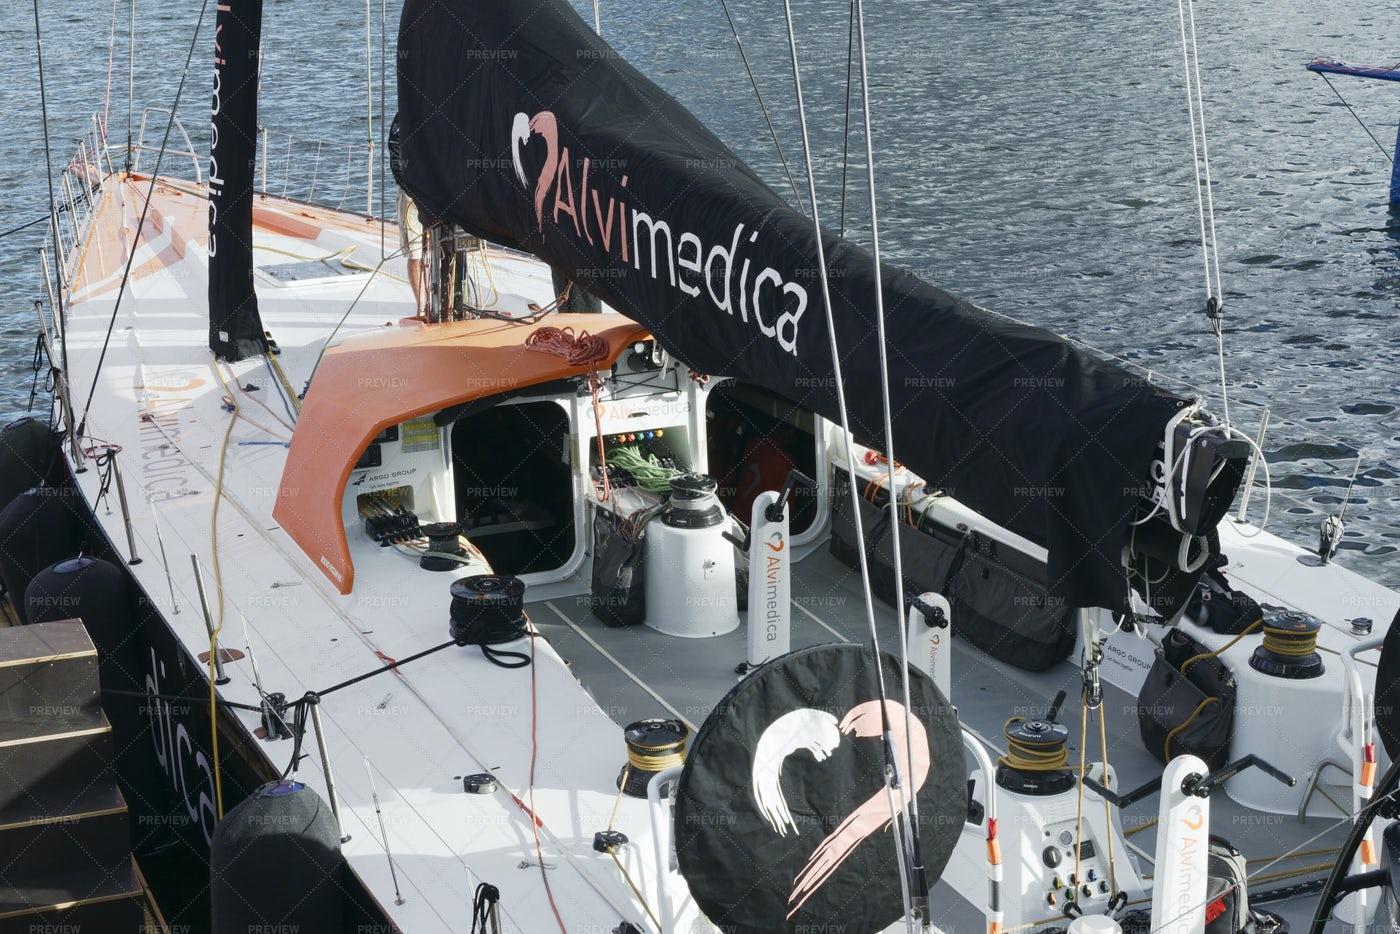 Alvimedica Boat: Stock Photos